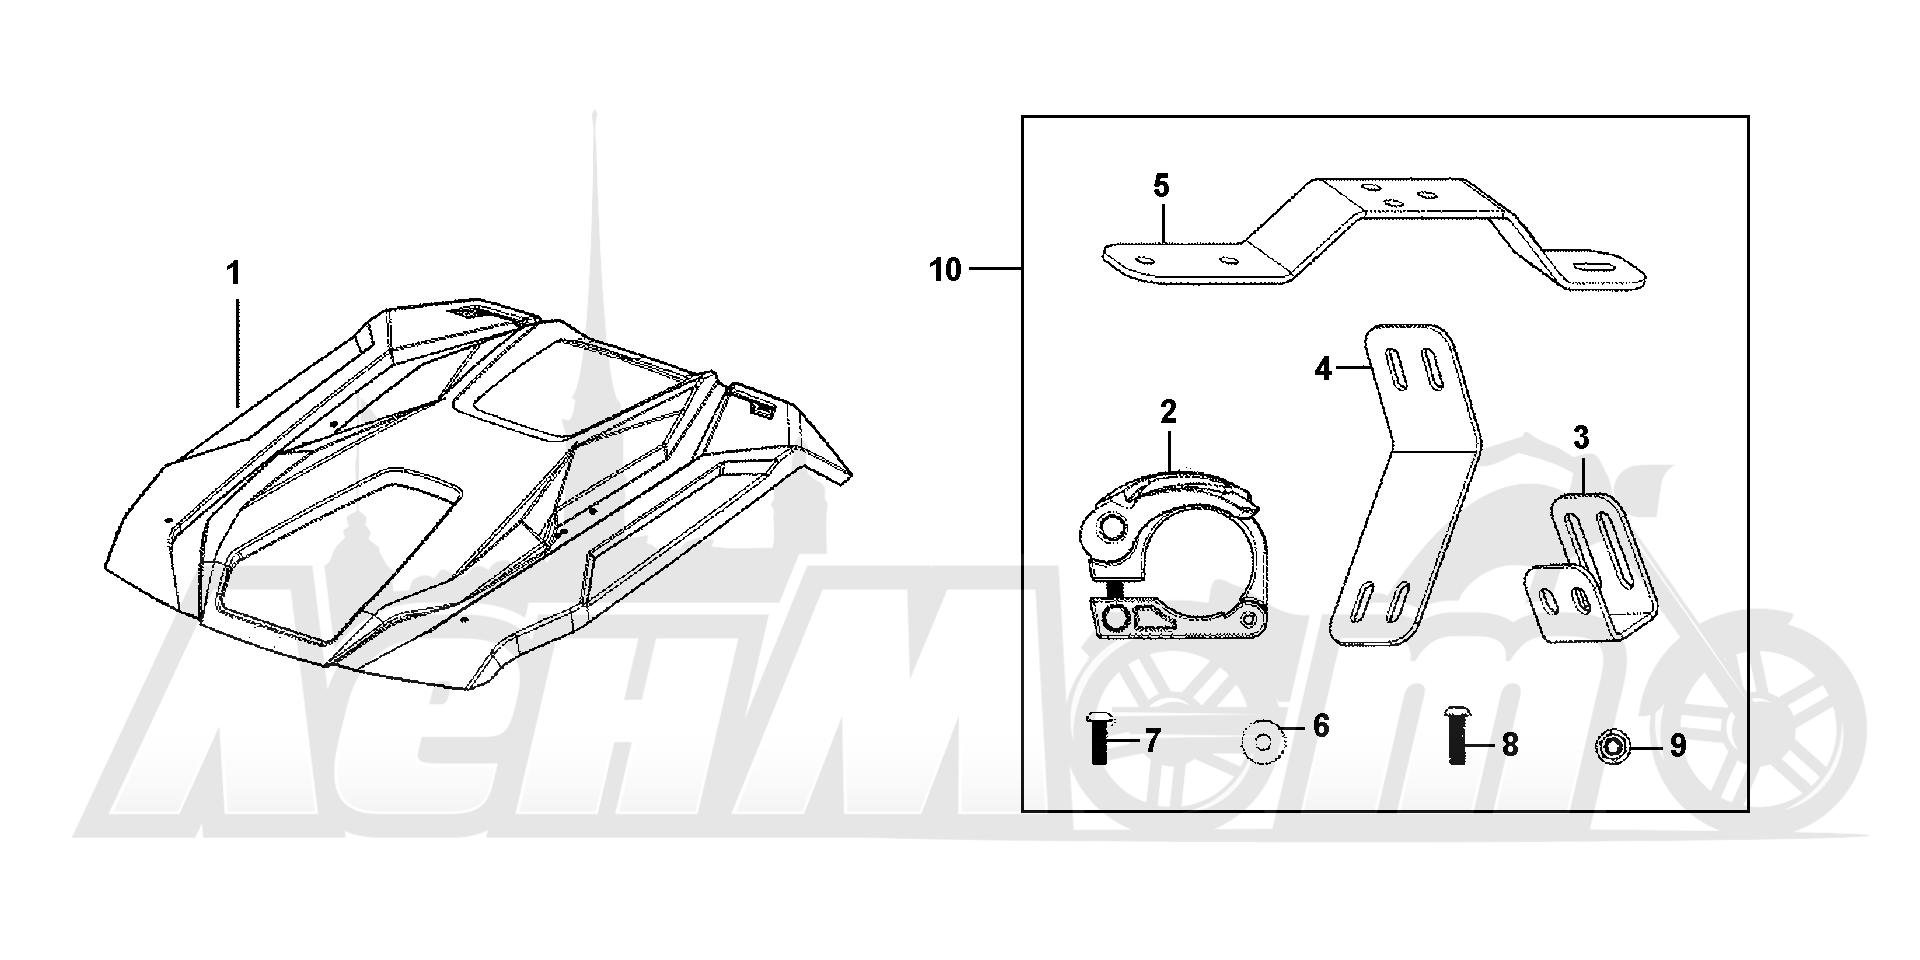 Запчасти для Квадроцикла Honda 2019 SXS1000M3L Раздел: HARD ROOF (5P) | HARD крыша (5P)